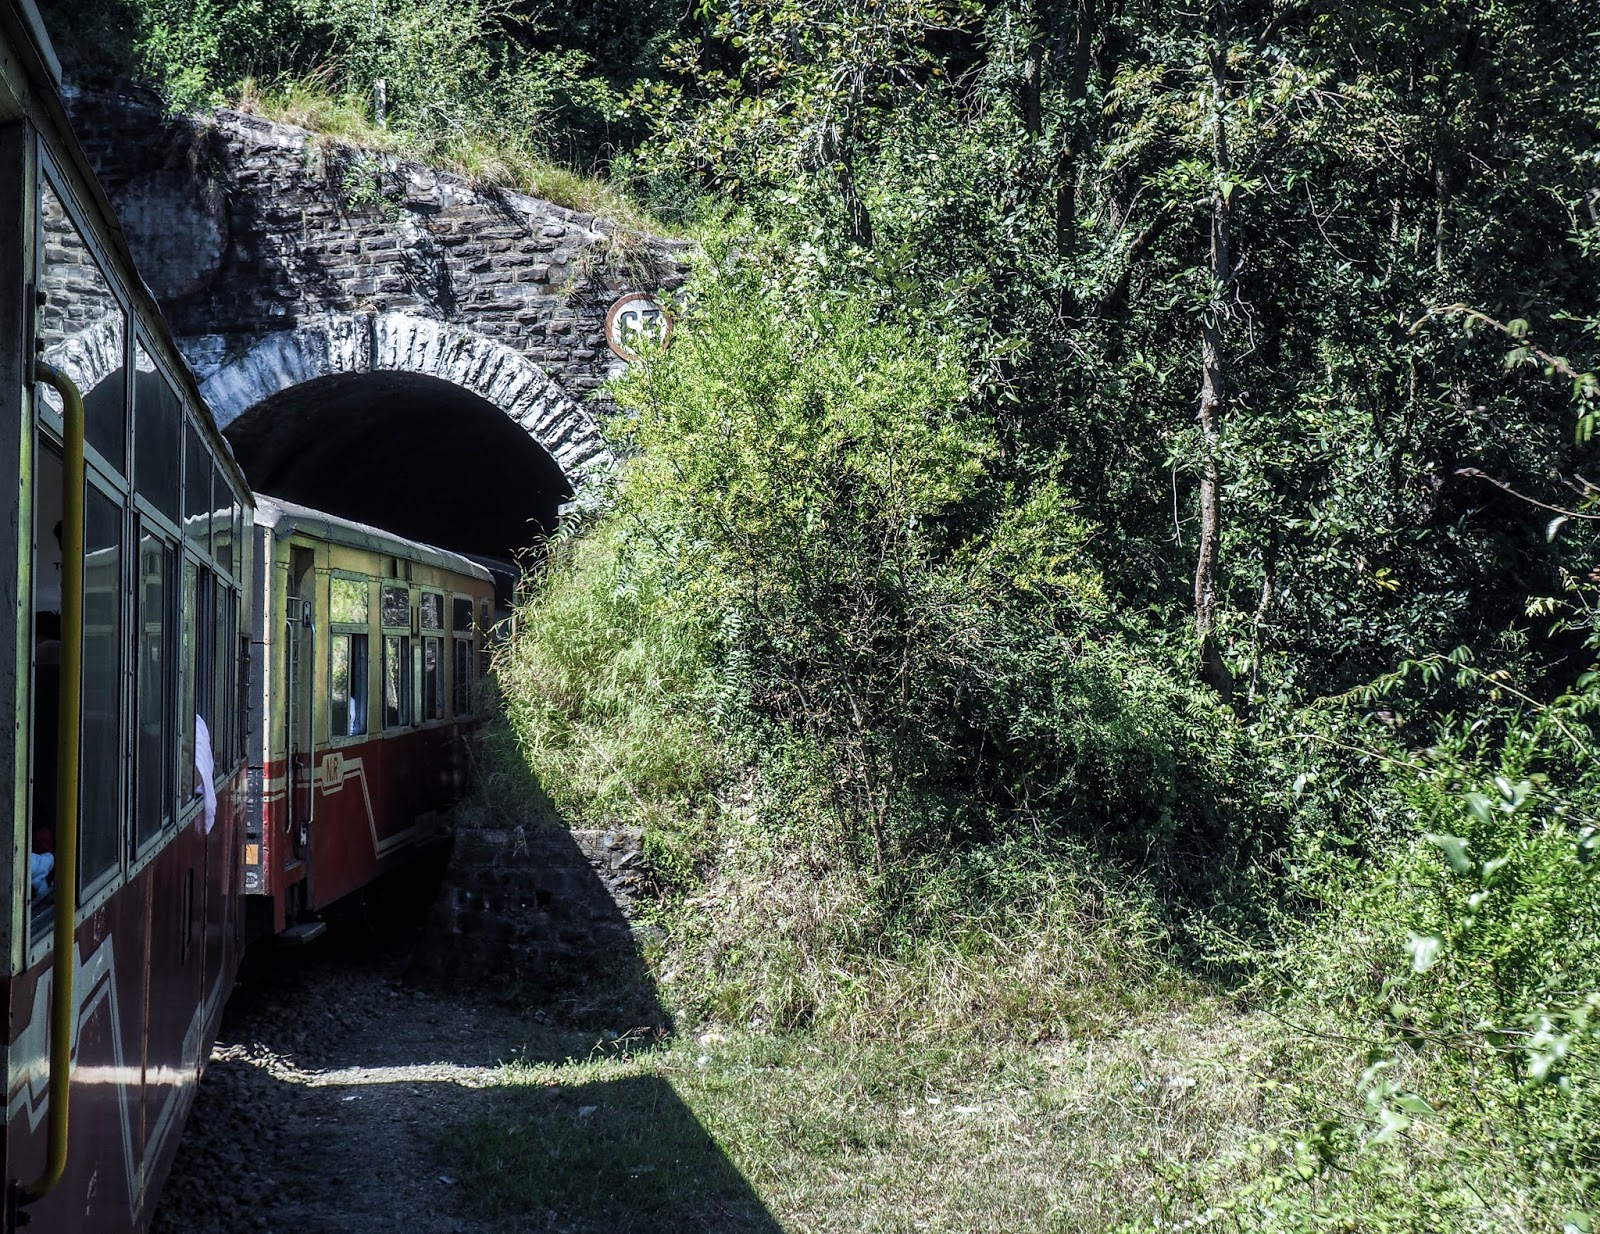 Intia, India, Kalka, Shimla, rautatie, railway, Northern India, Pohjois-Intia, train trip, junamatka, toy train,